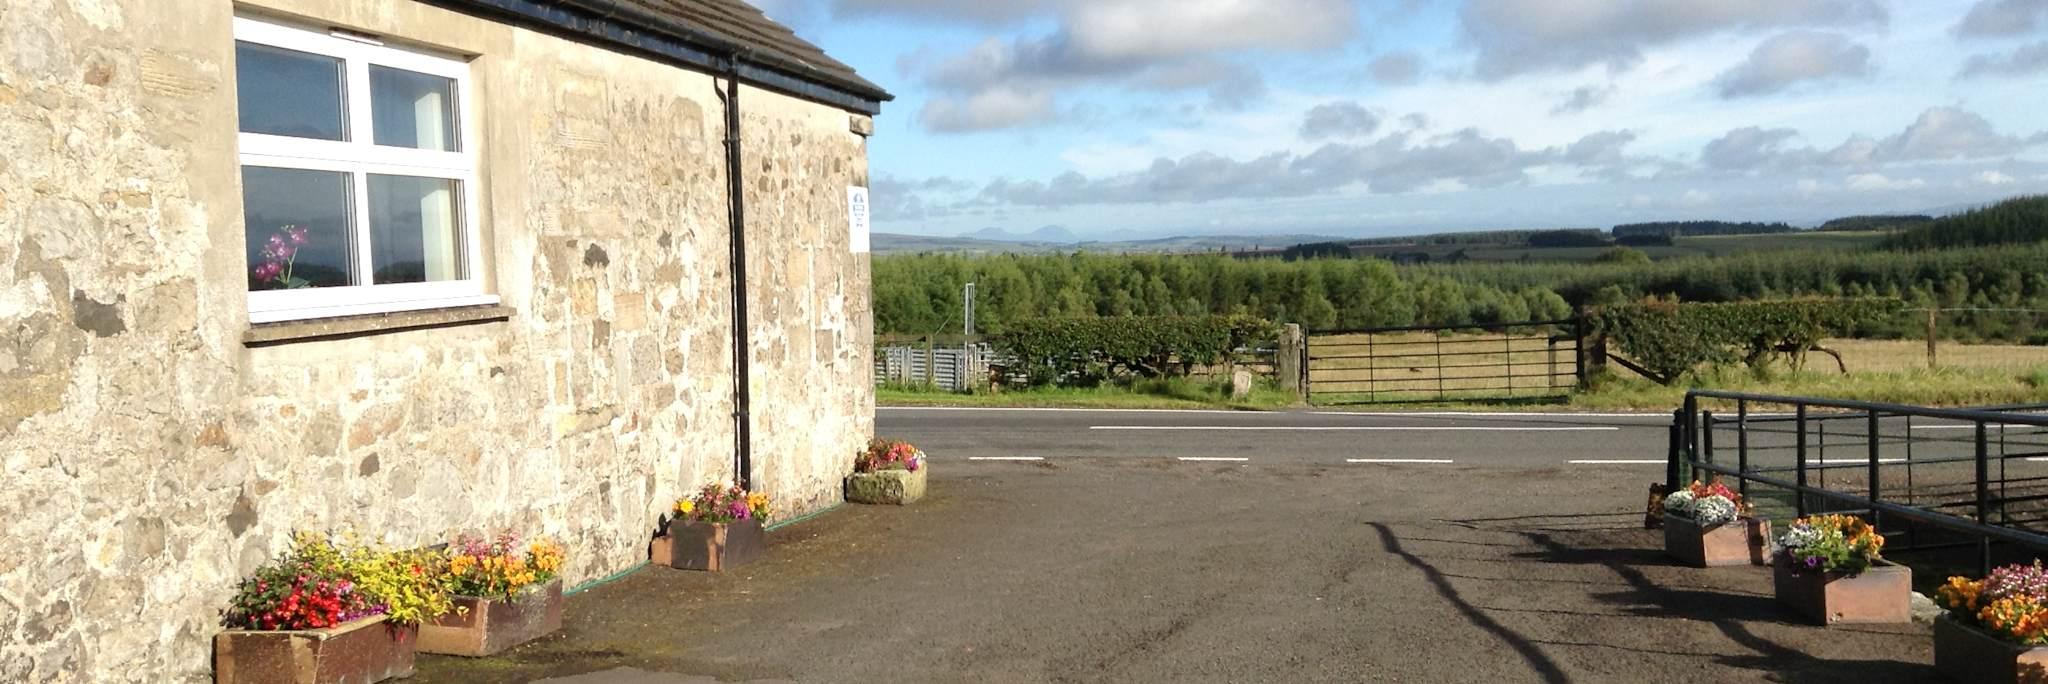 Easter Glentore Farm near Airdrie